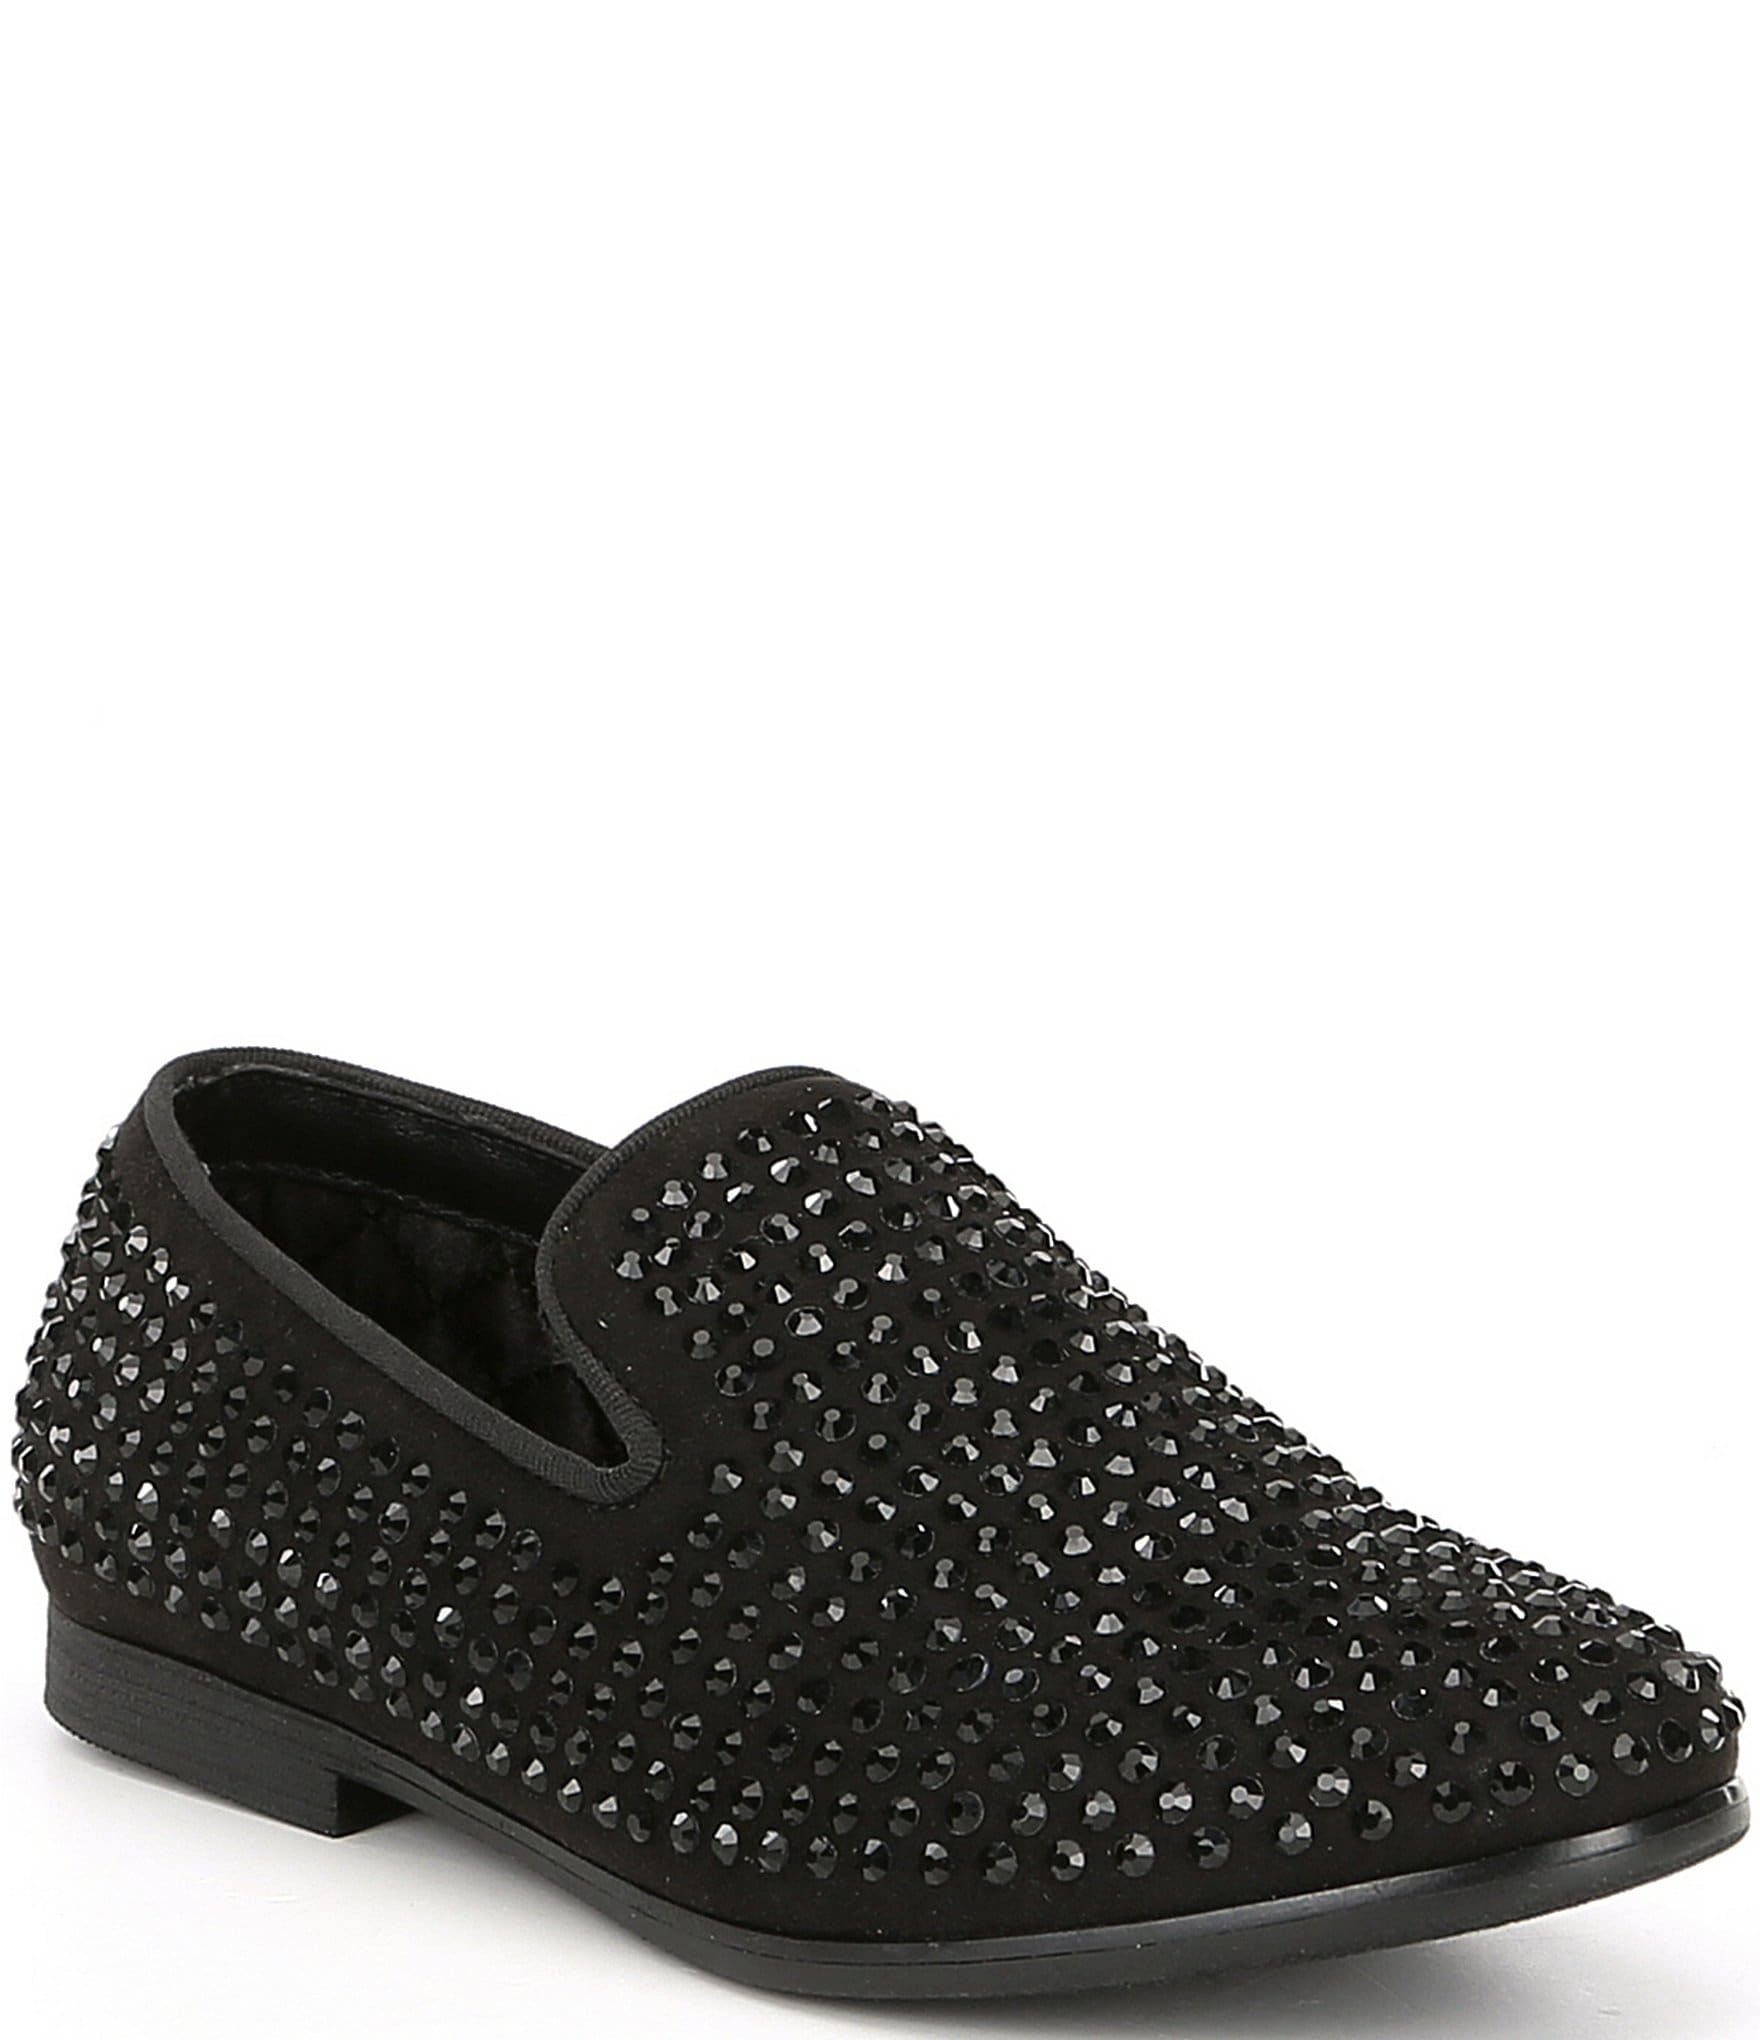 a41cf1e93ab Steve Madden Boy's B-Caviar Rhinestone Studded Slip On Loafers | Dillard's